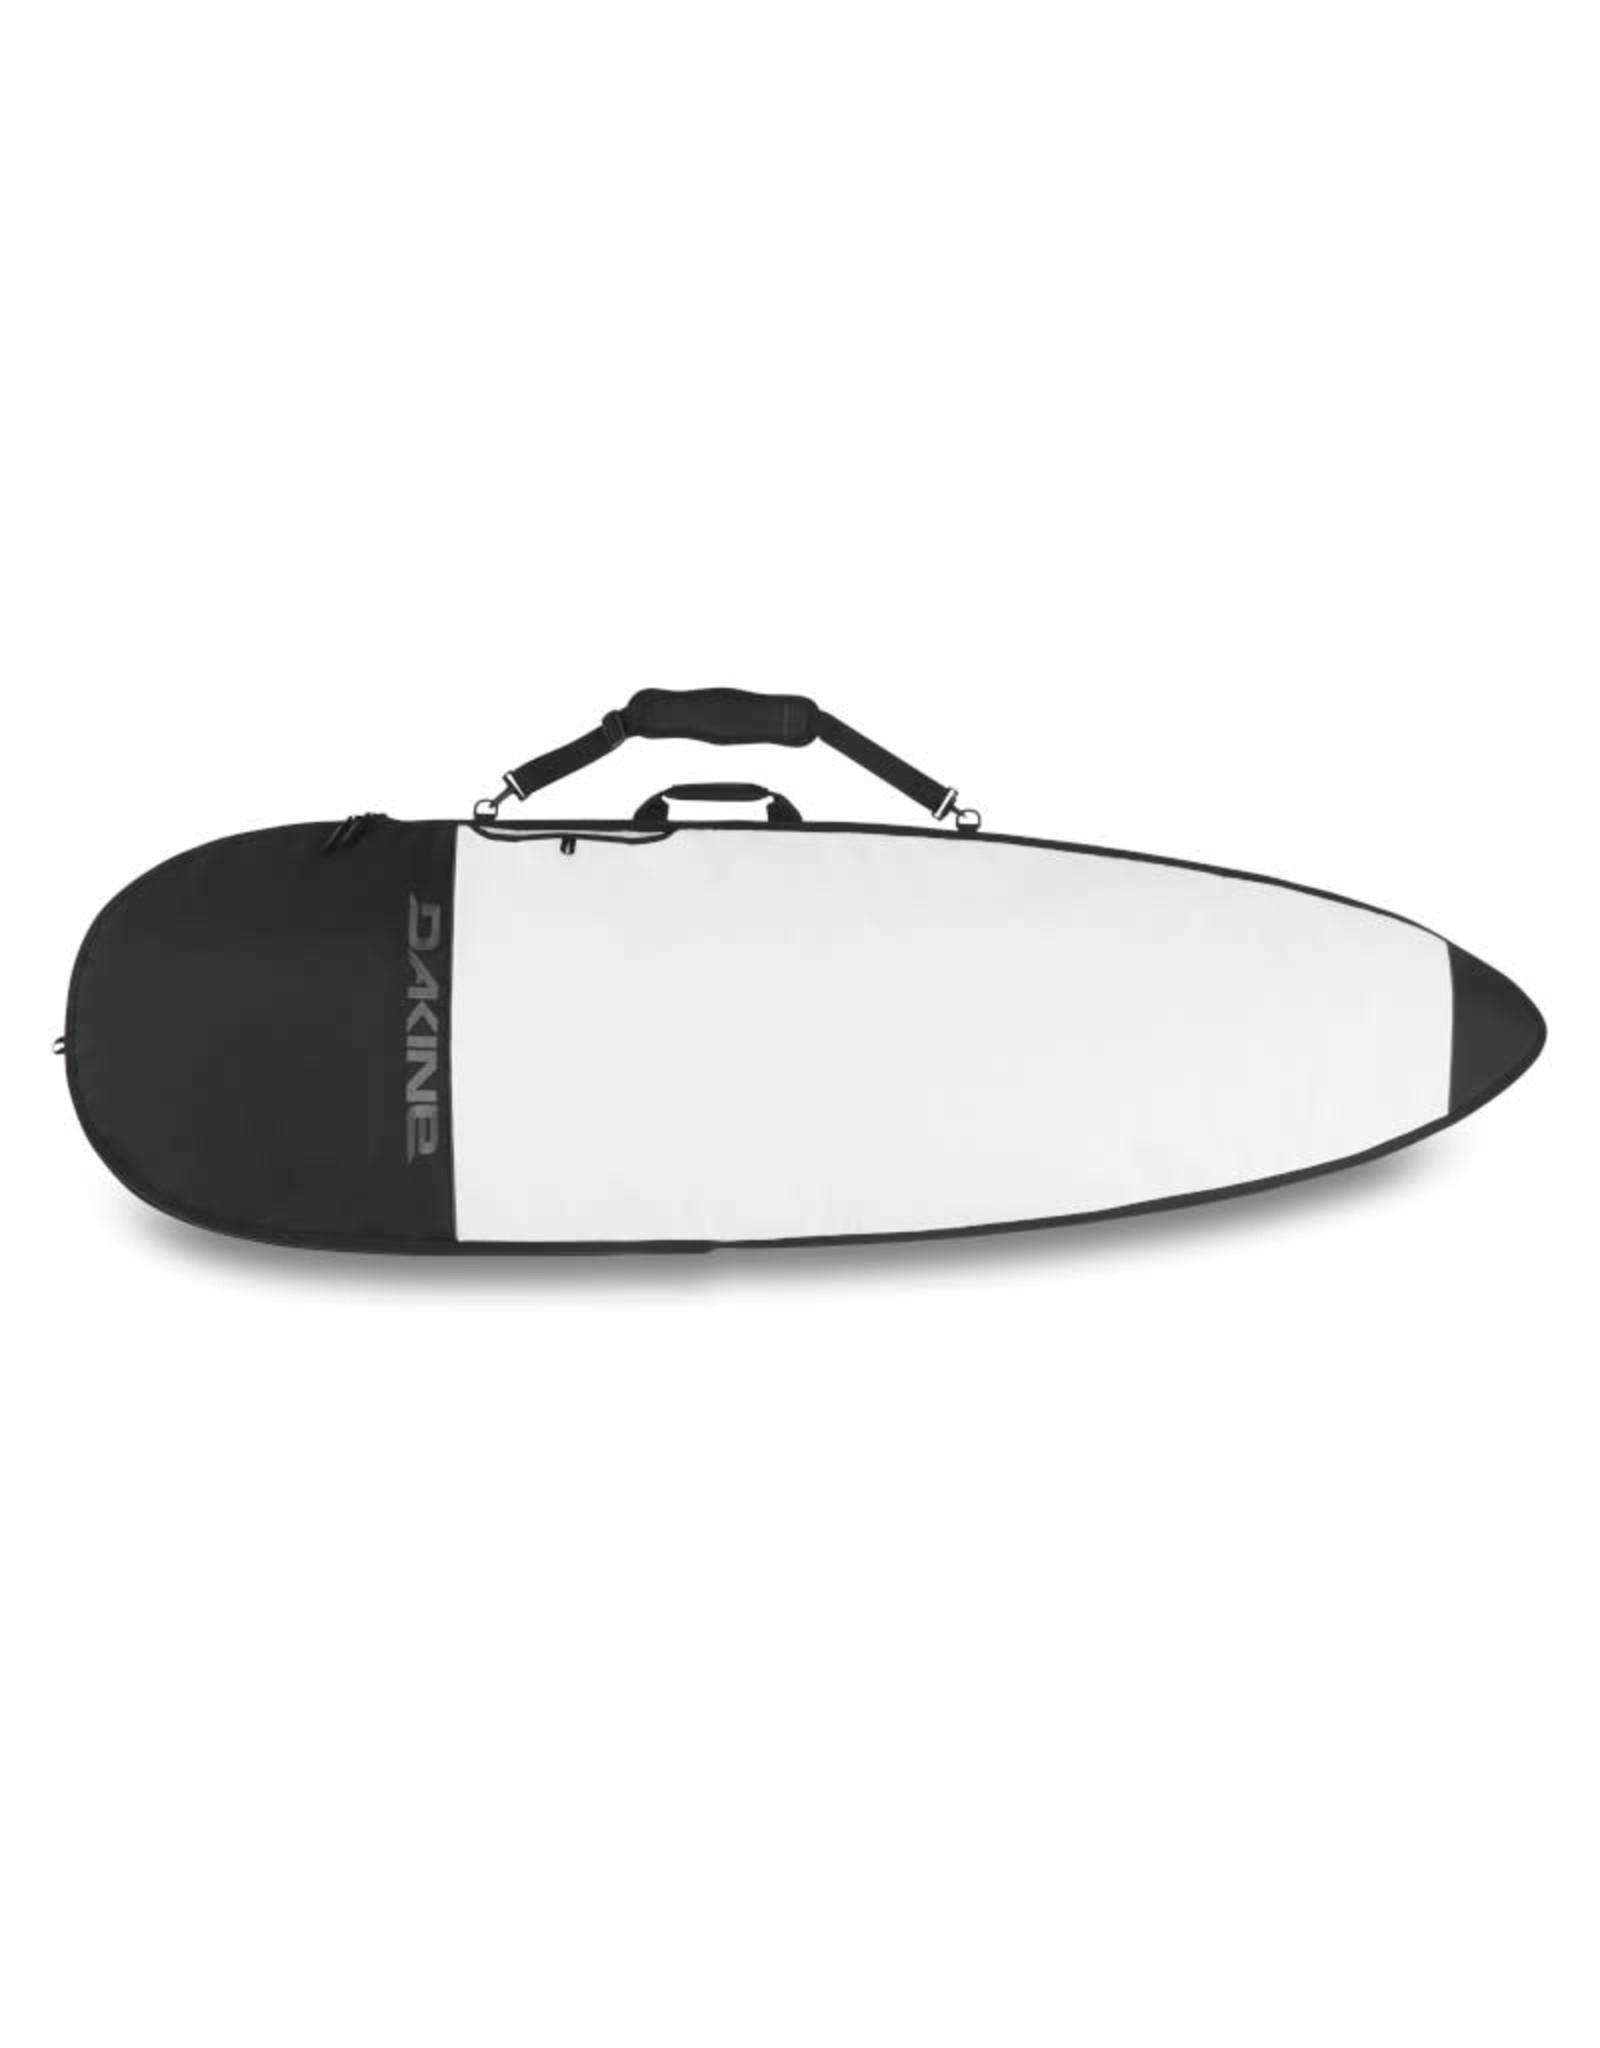 "Dakine Dakine 6'3"" Daylight Truster Surfboard Bag White"